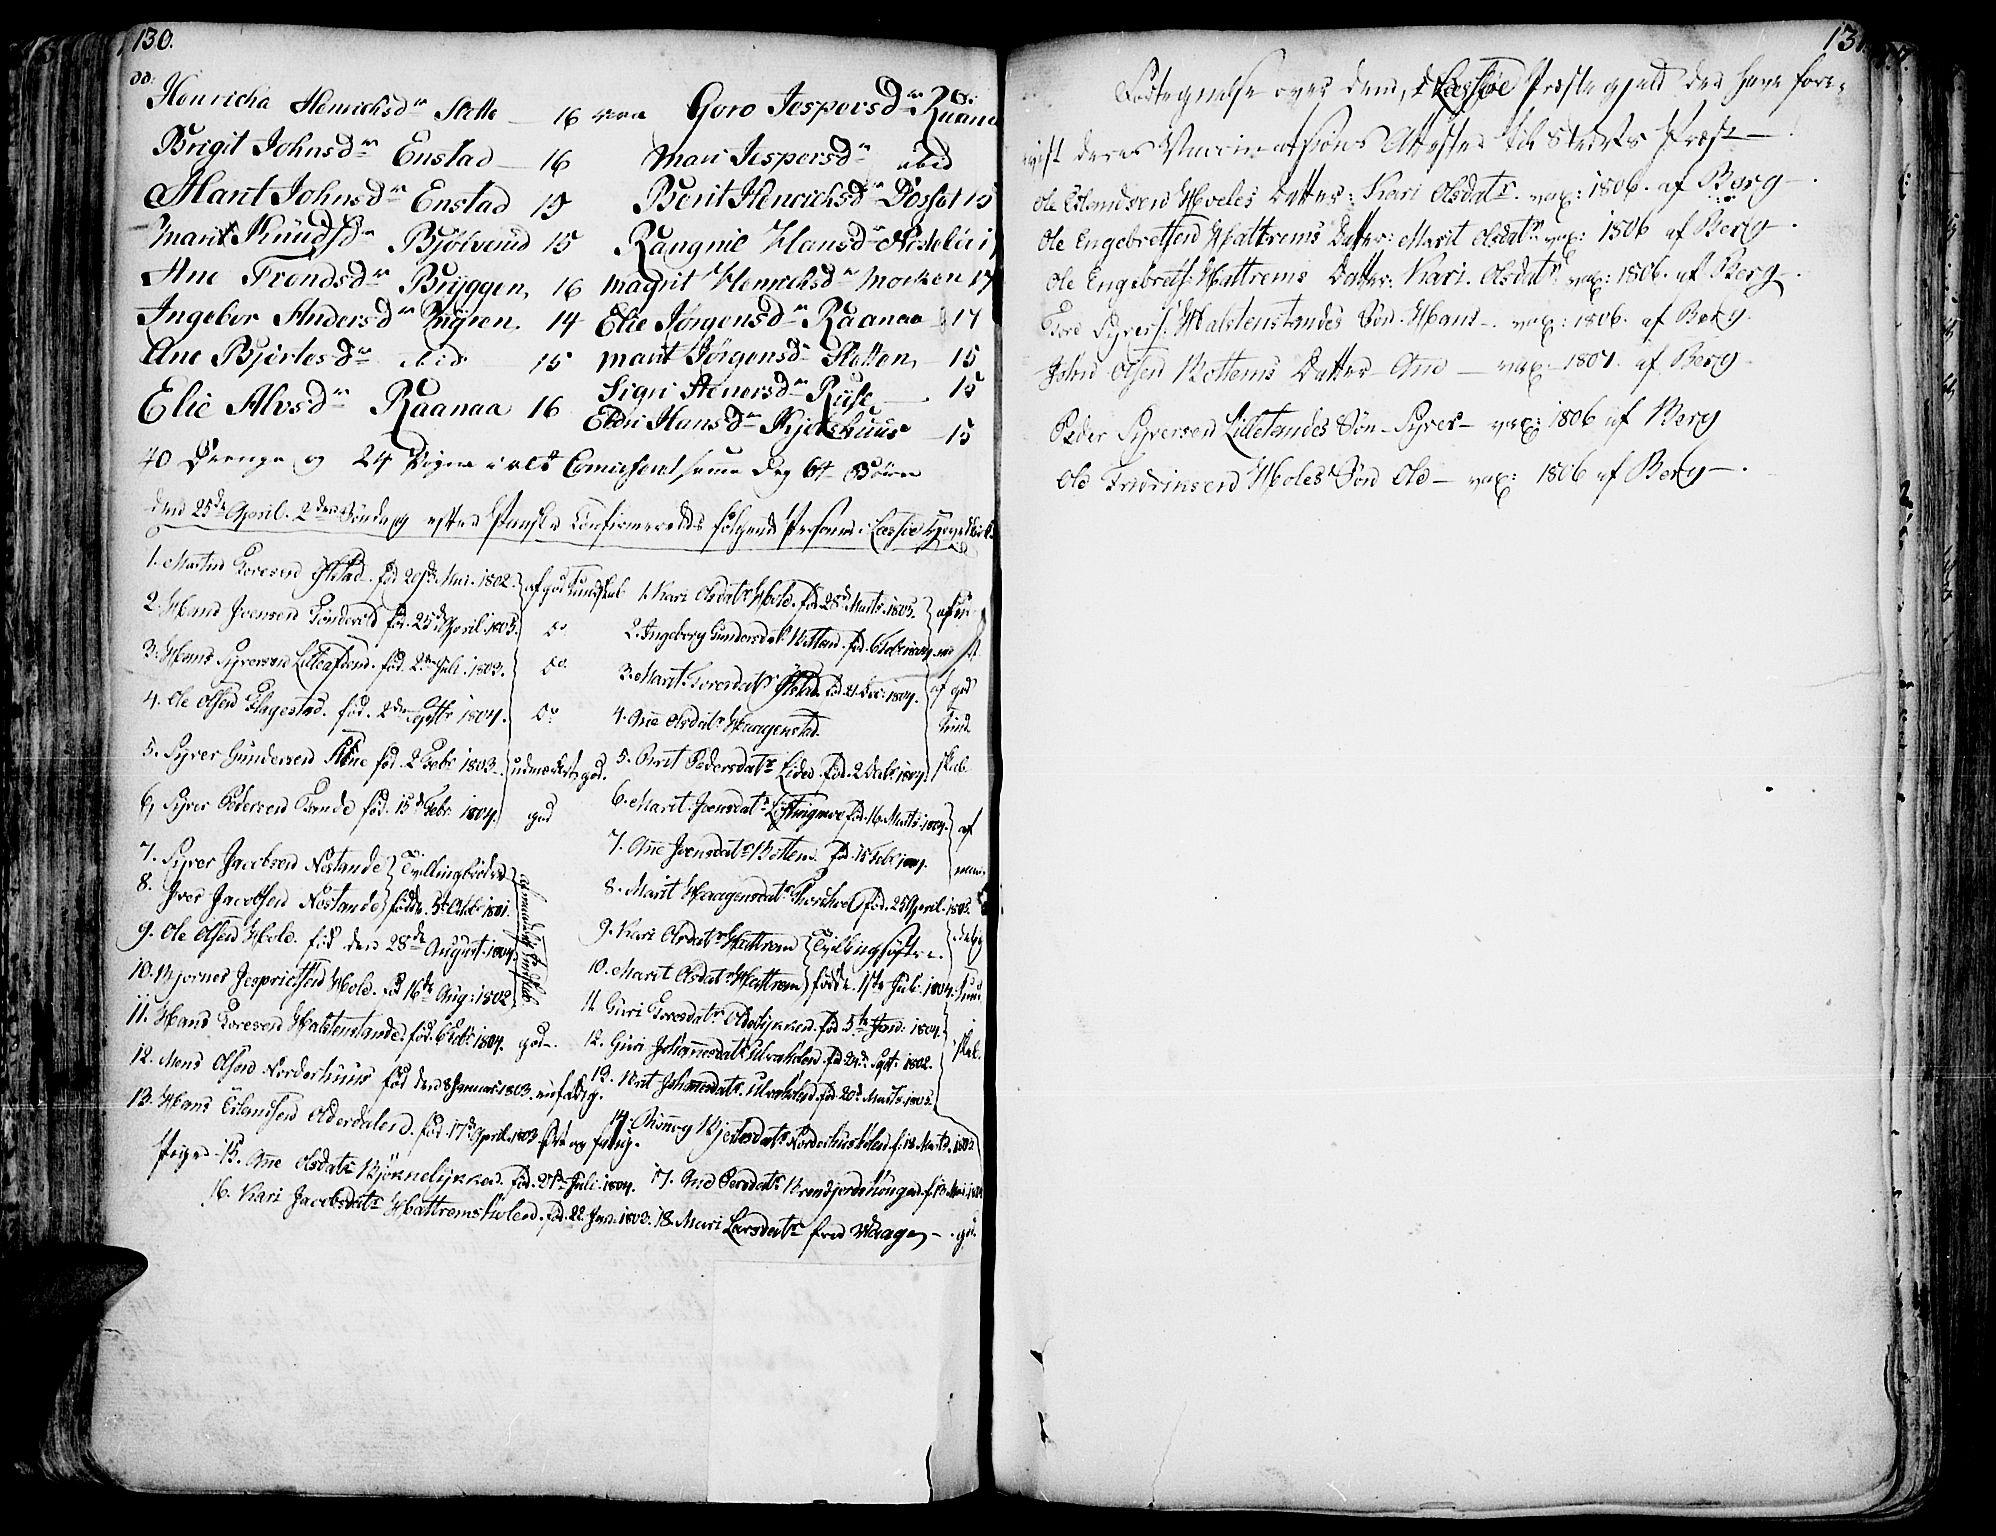 SAH, Lesja prestekontor, Parish register (official) no. 2, 1732-1776, p. 130-131